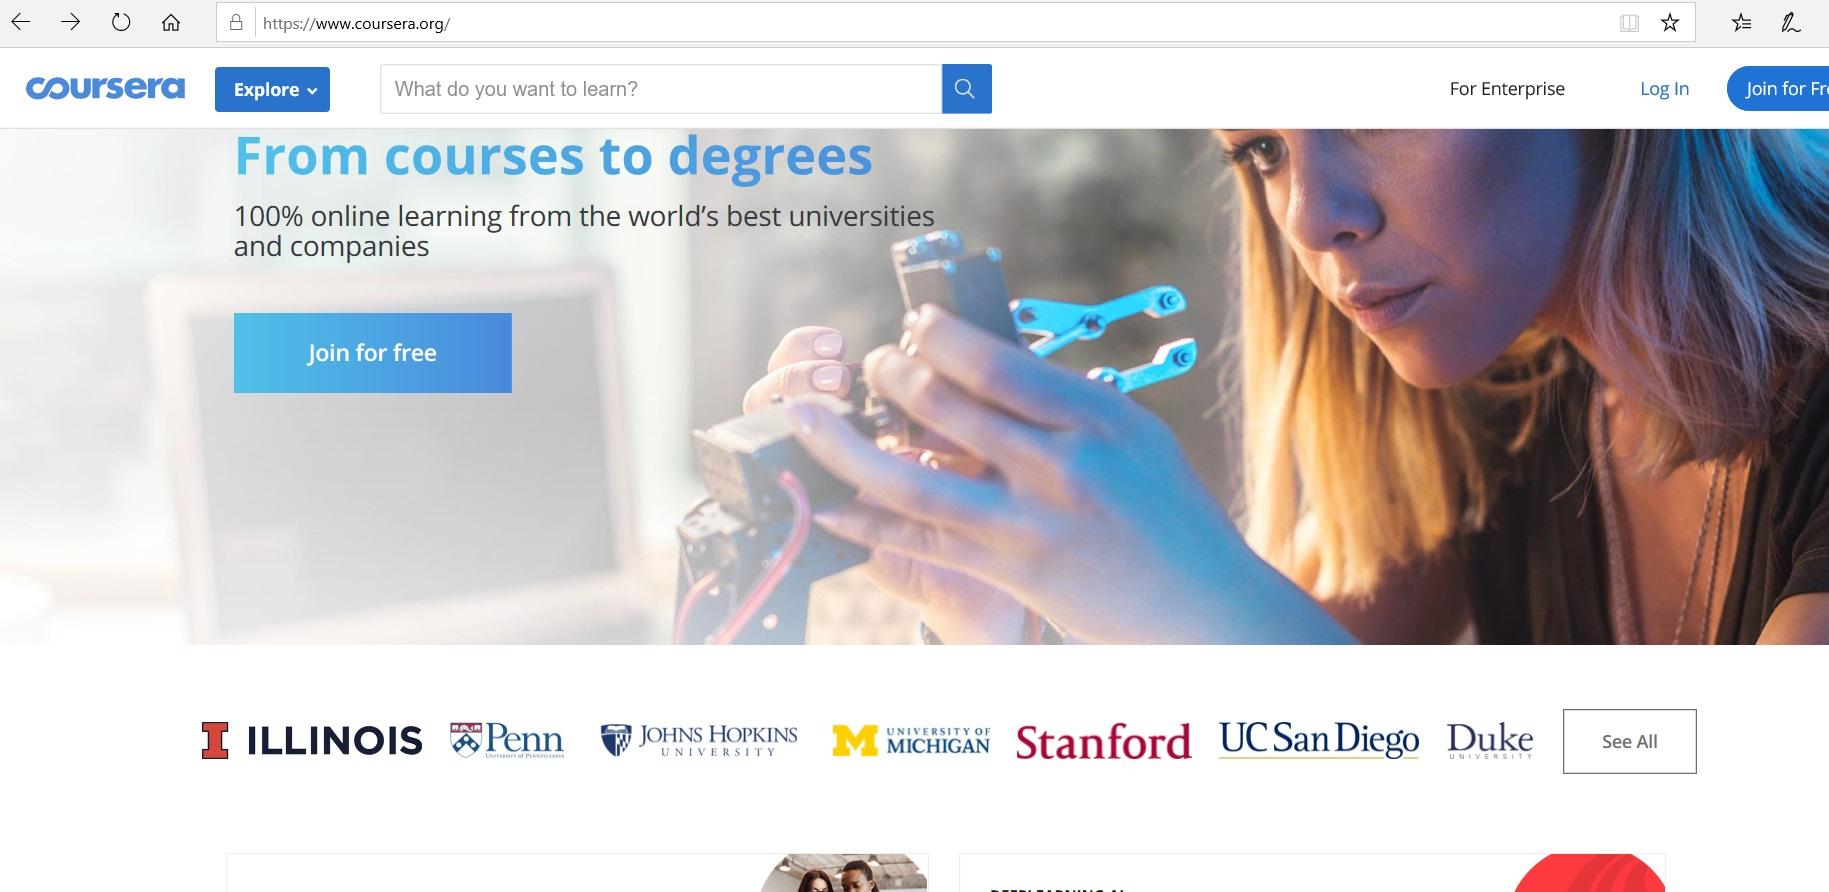 Coursera website homepage.